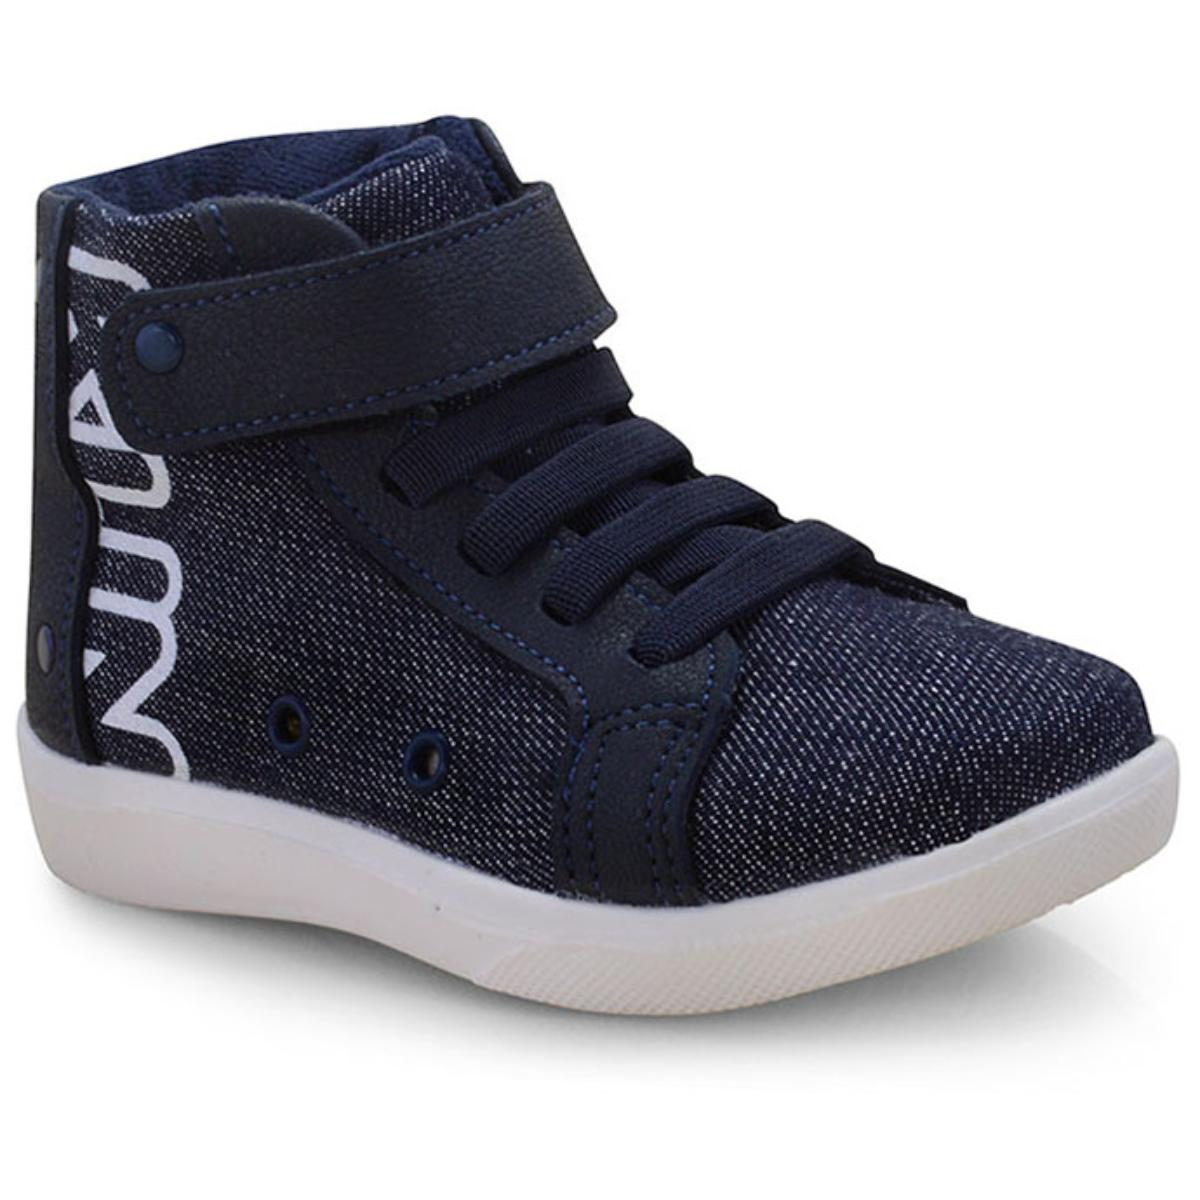 Tênis Masc Infantil Klin 170.067 Marinho/jeans